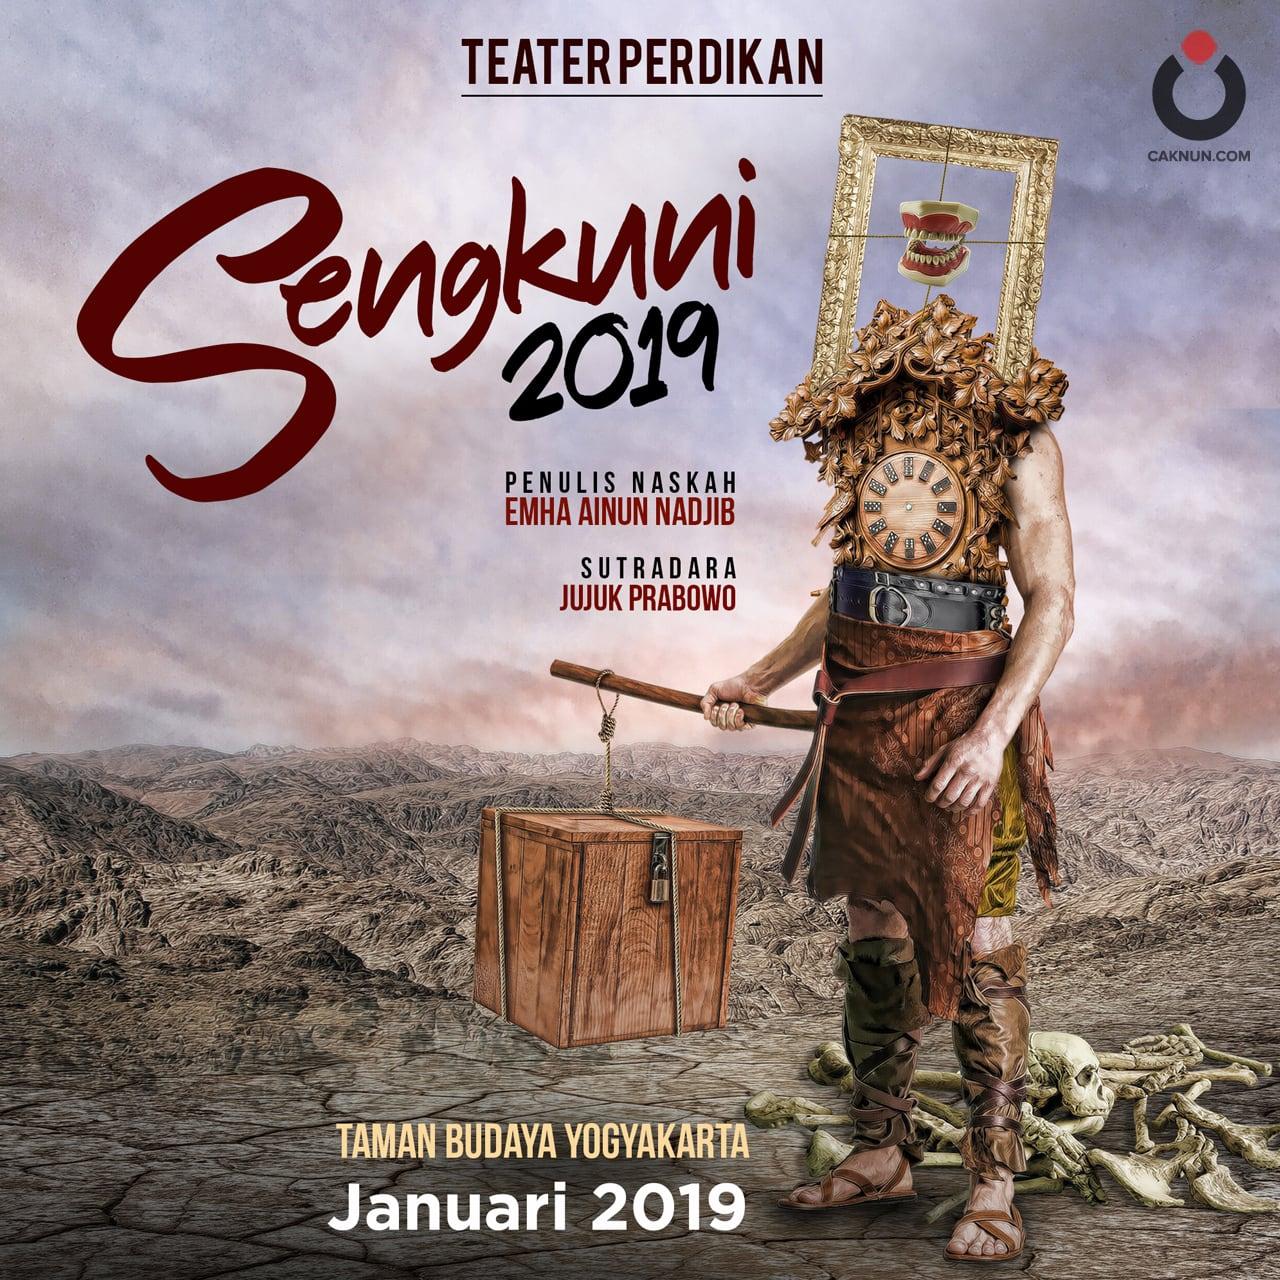 #Sengkuni2019